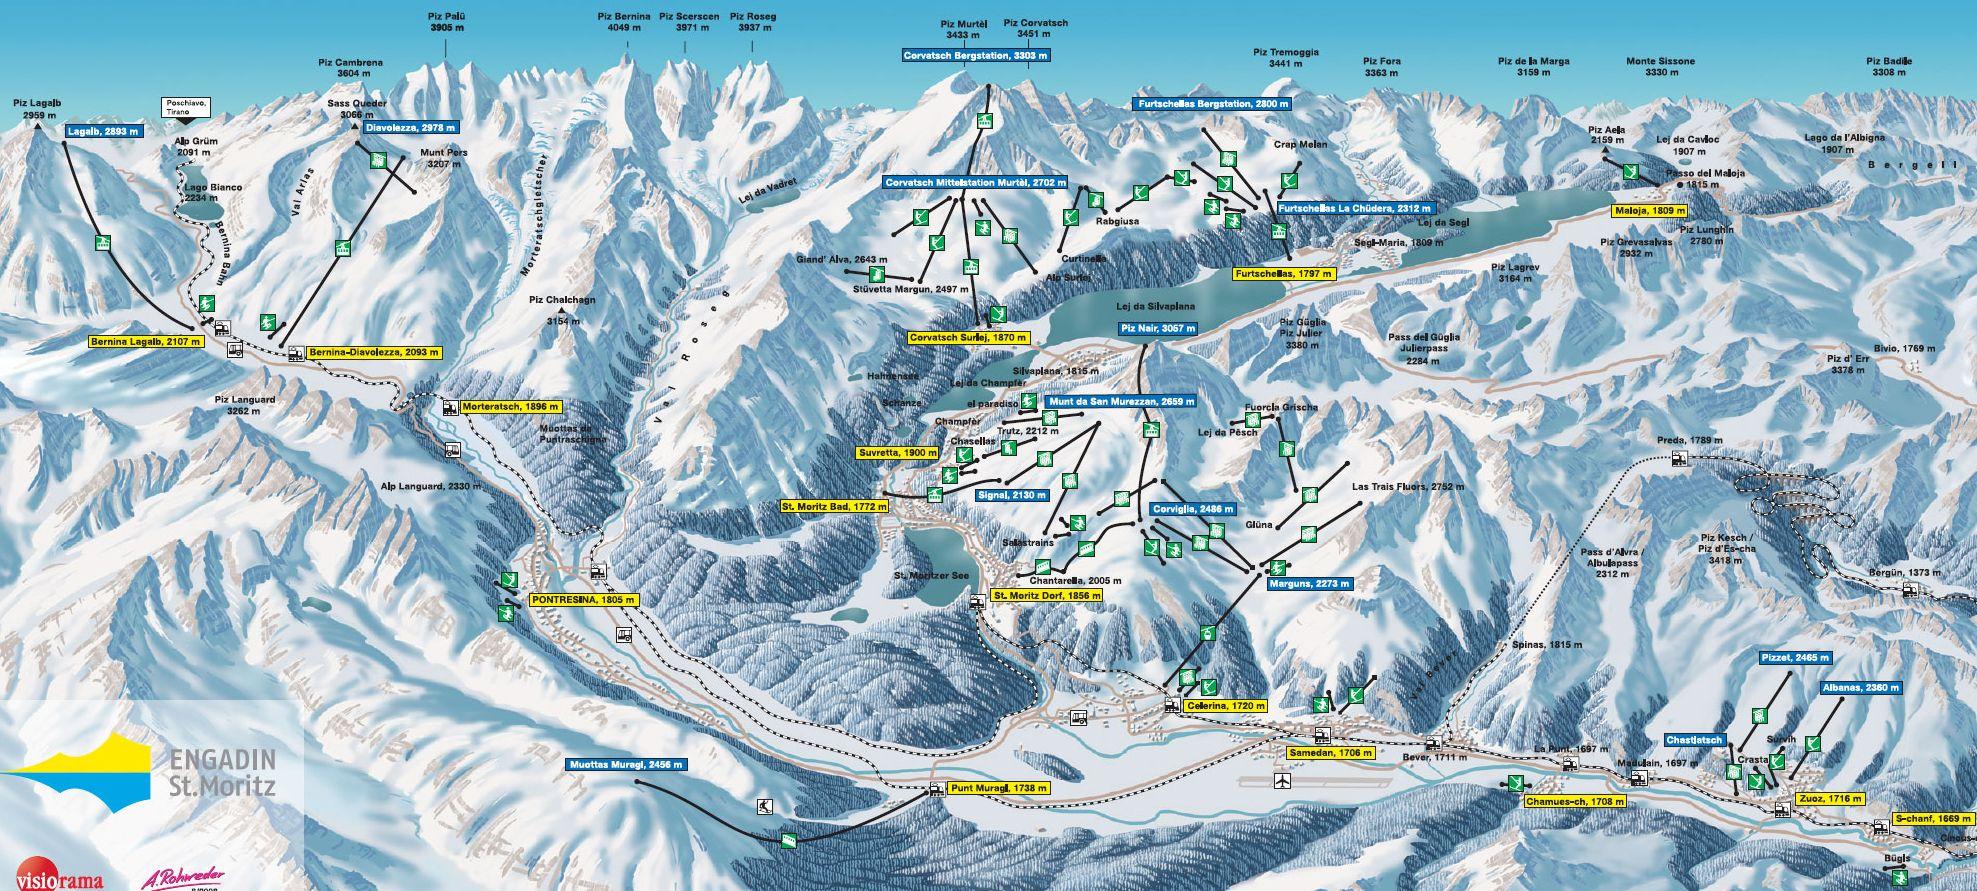 St. Moritz - Бронируйте апартаменты и шале у bei ski-suisse.com